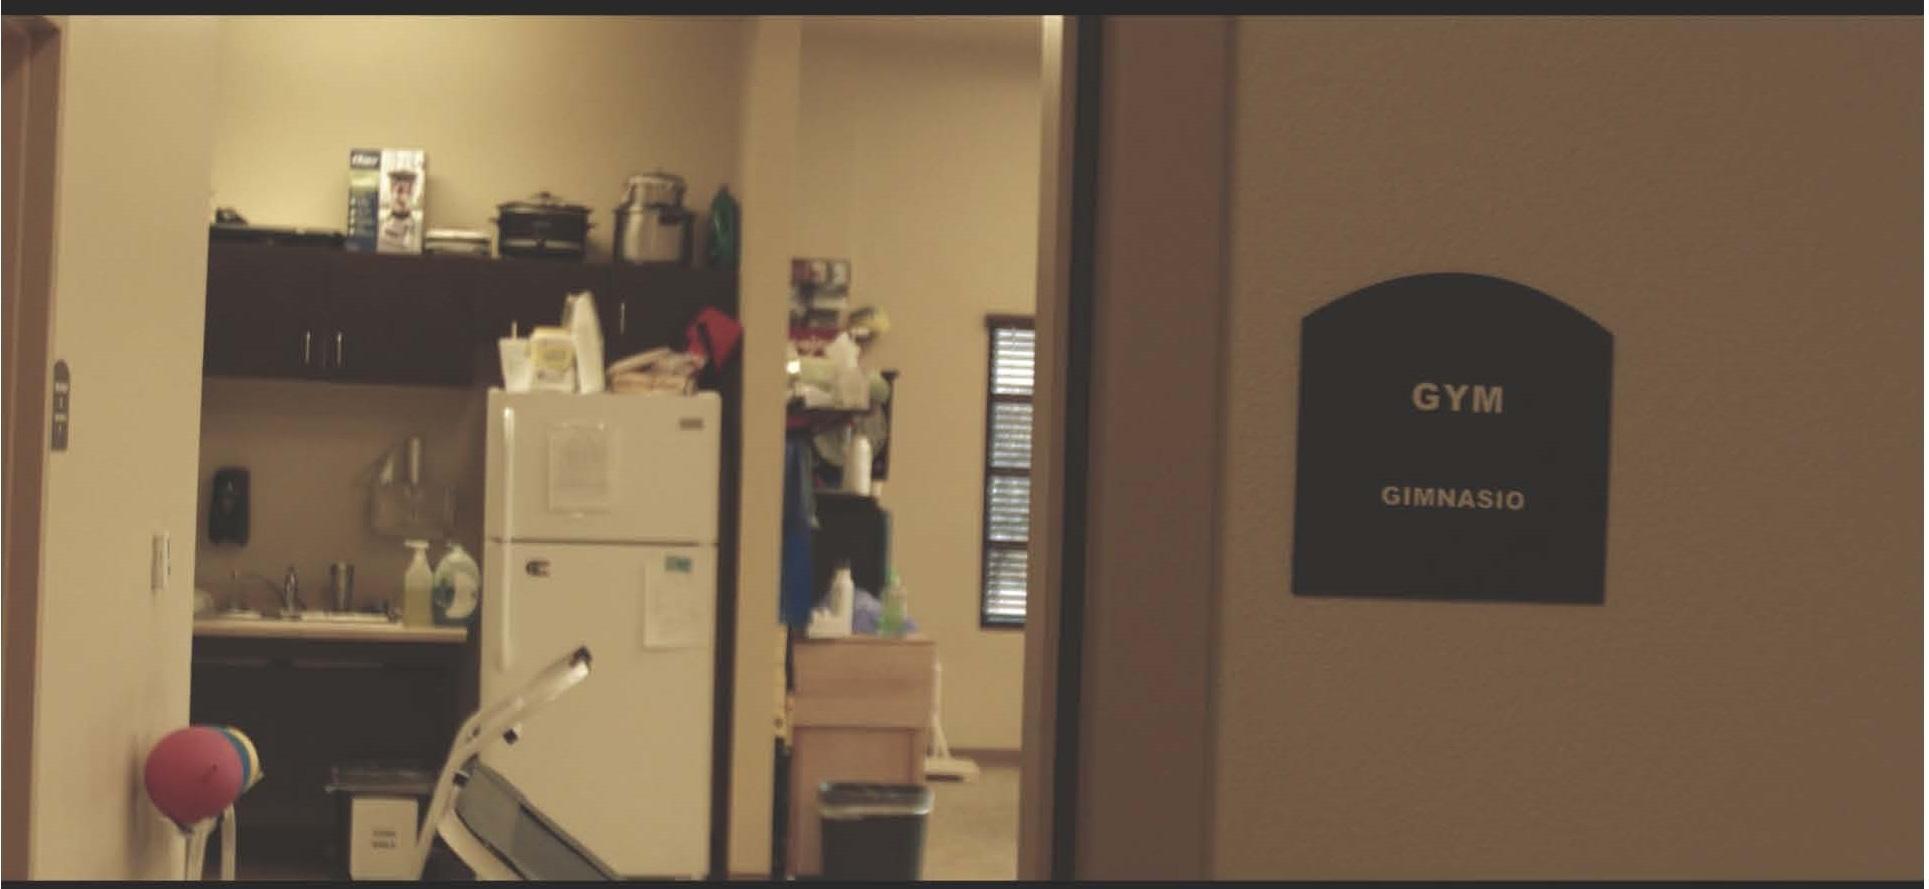 Mentis Neuro - El Paso Location Virtual Tour-HD on Vimeo5